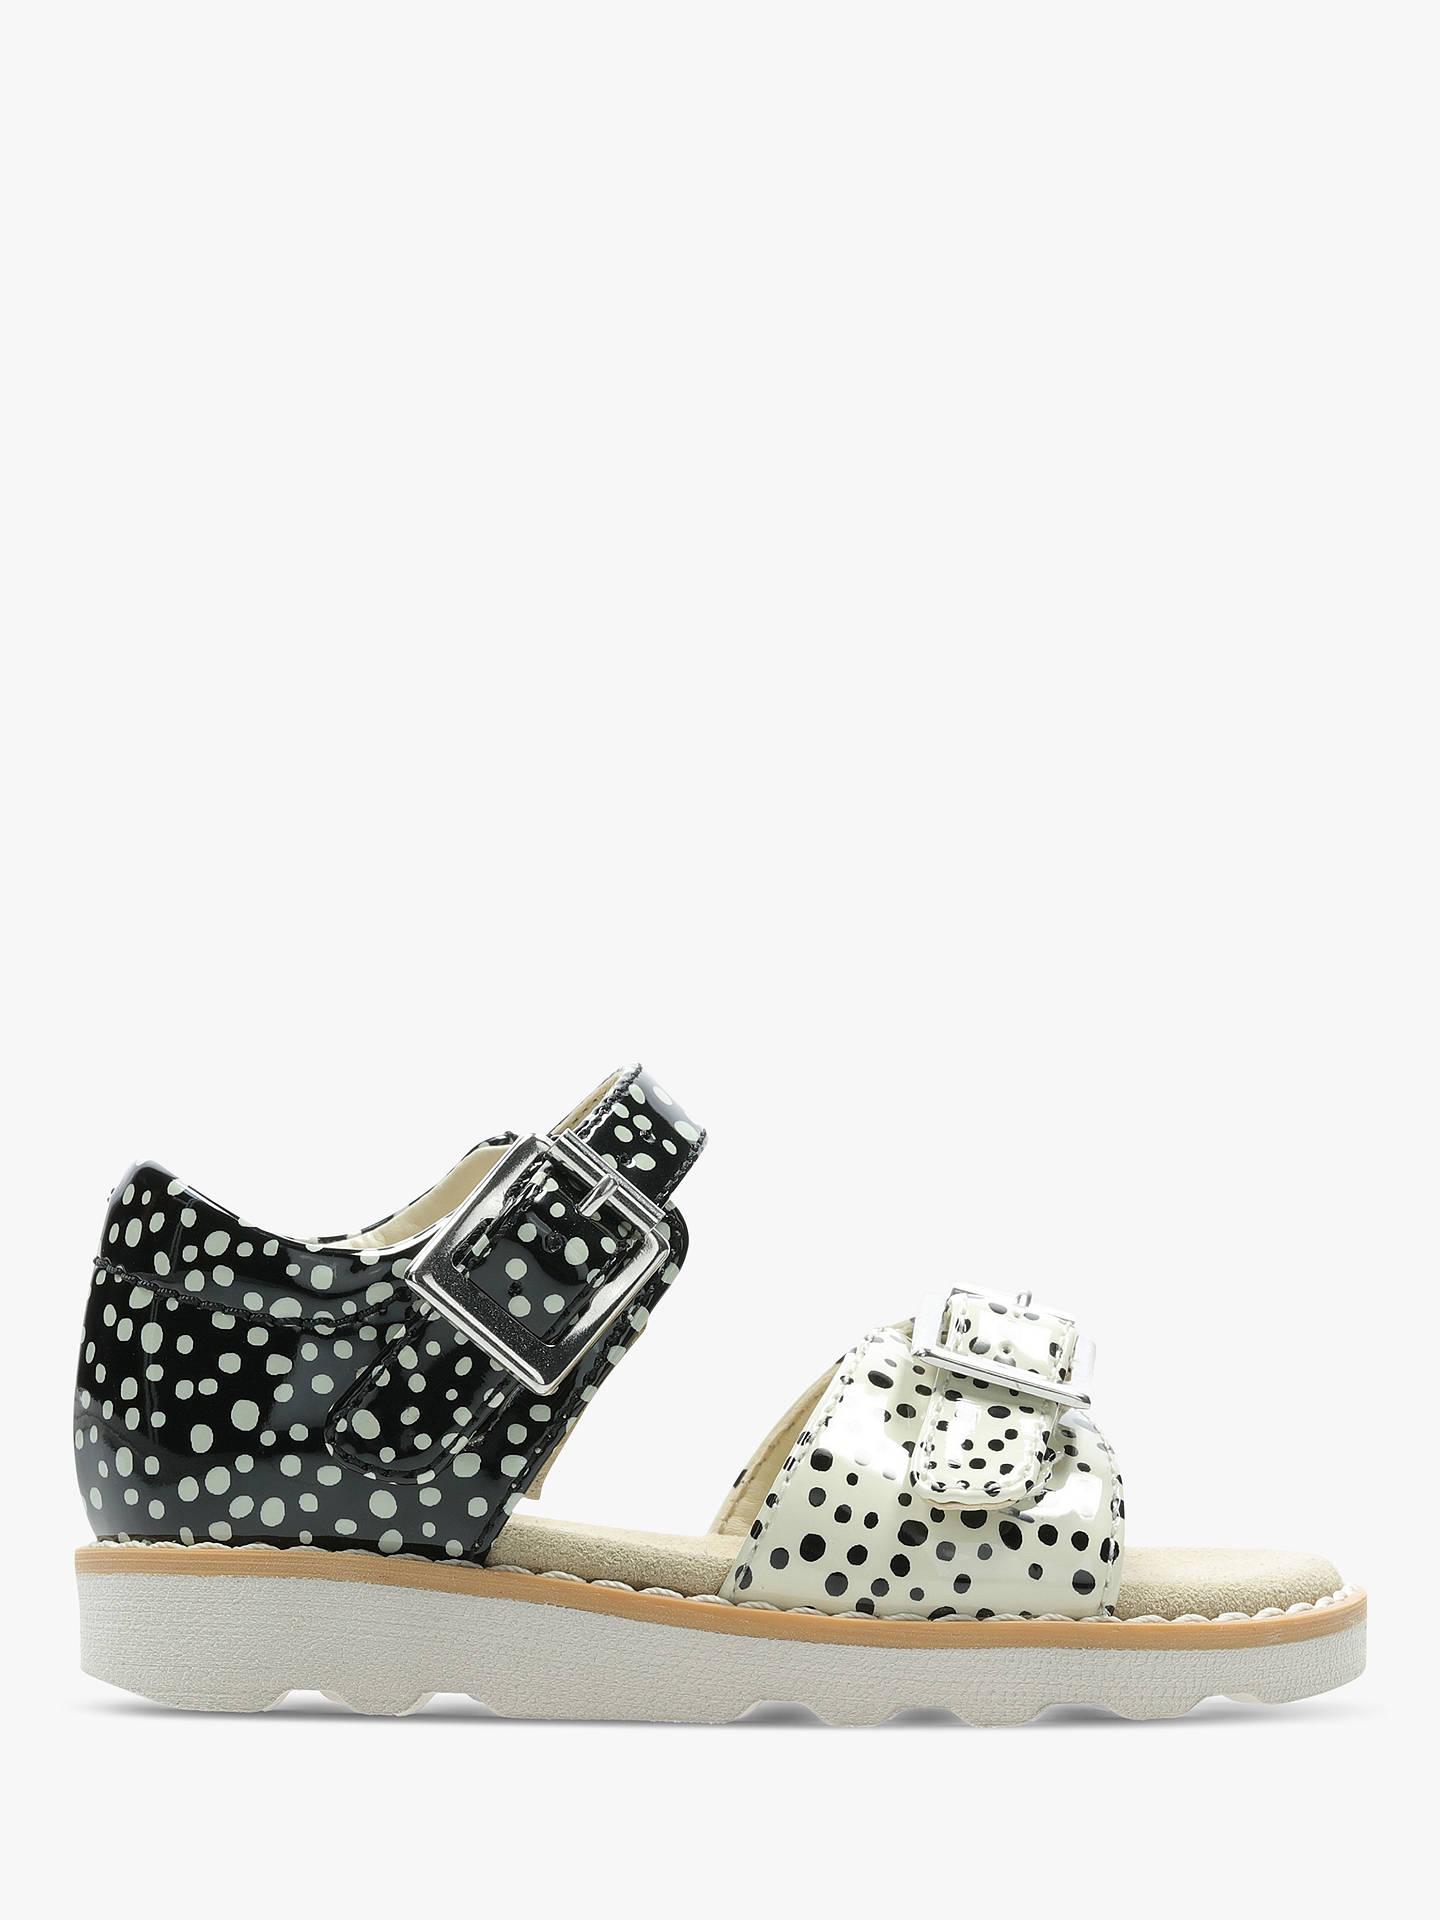 38a62d40f5f Buy Clarks Children s Crown Bloom Spot Print Sandals